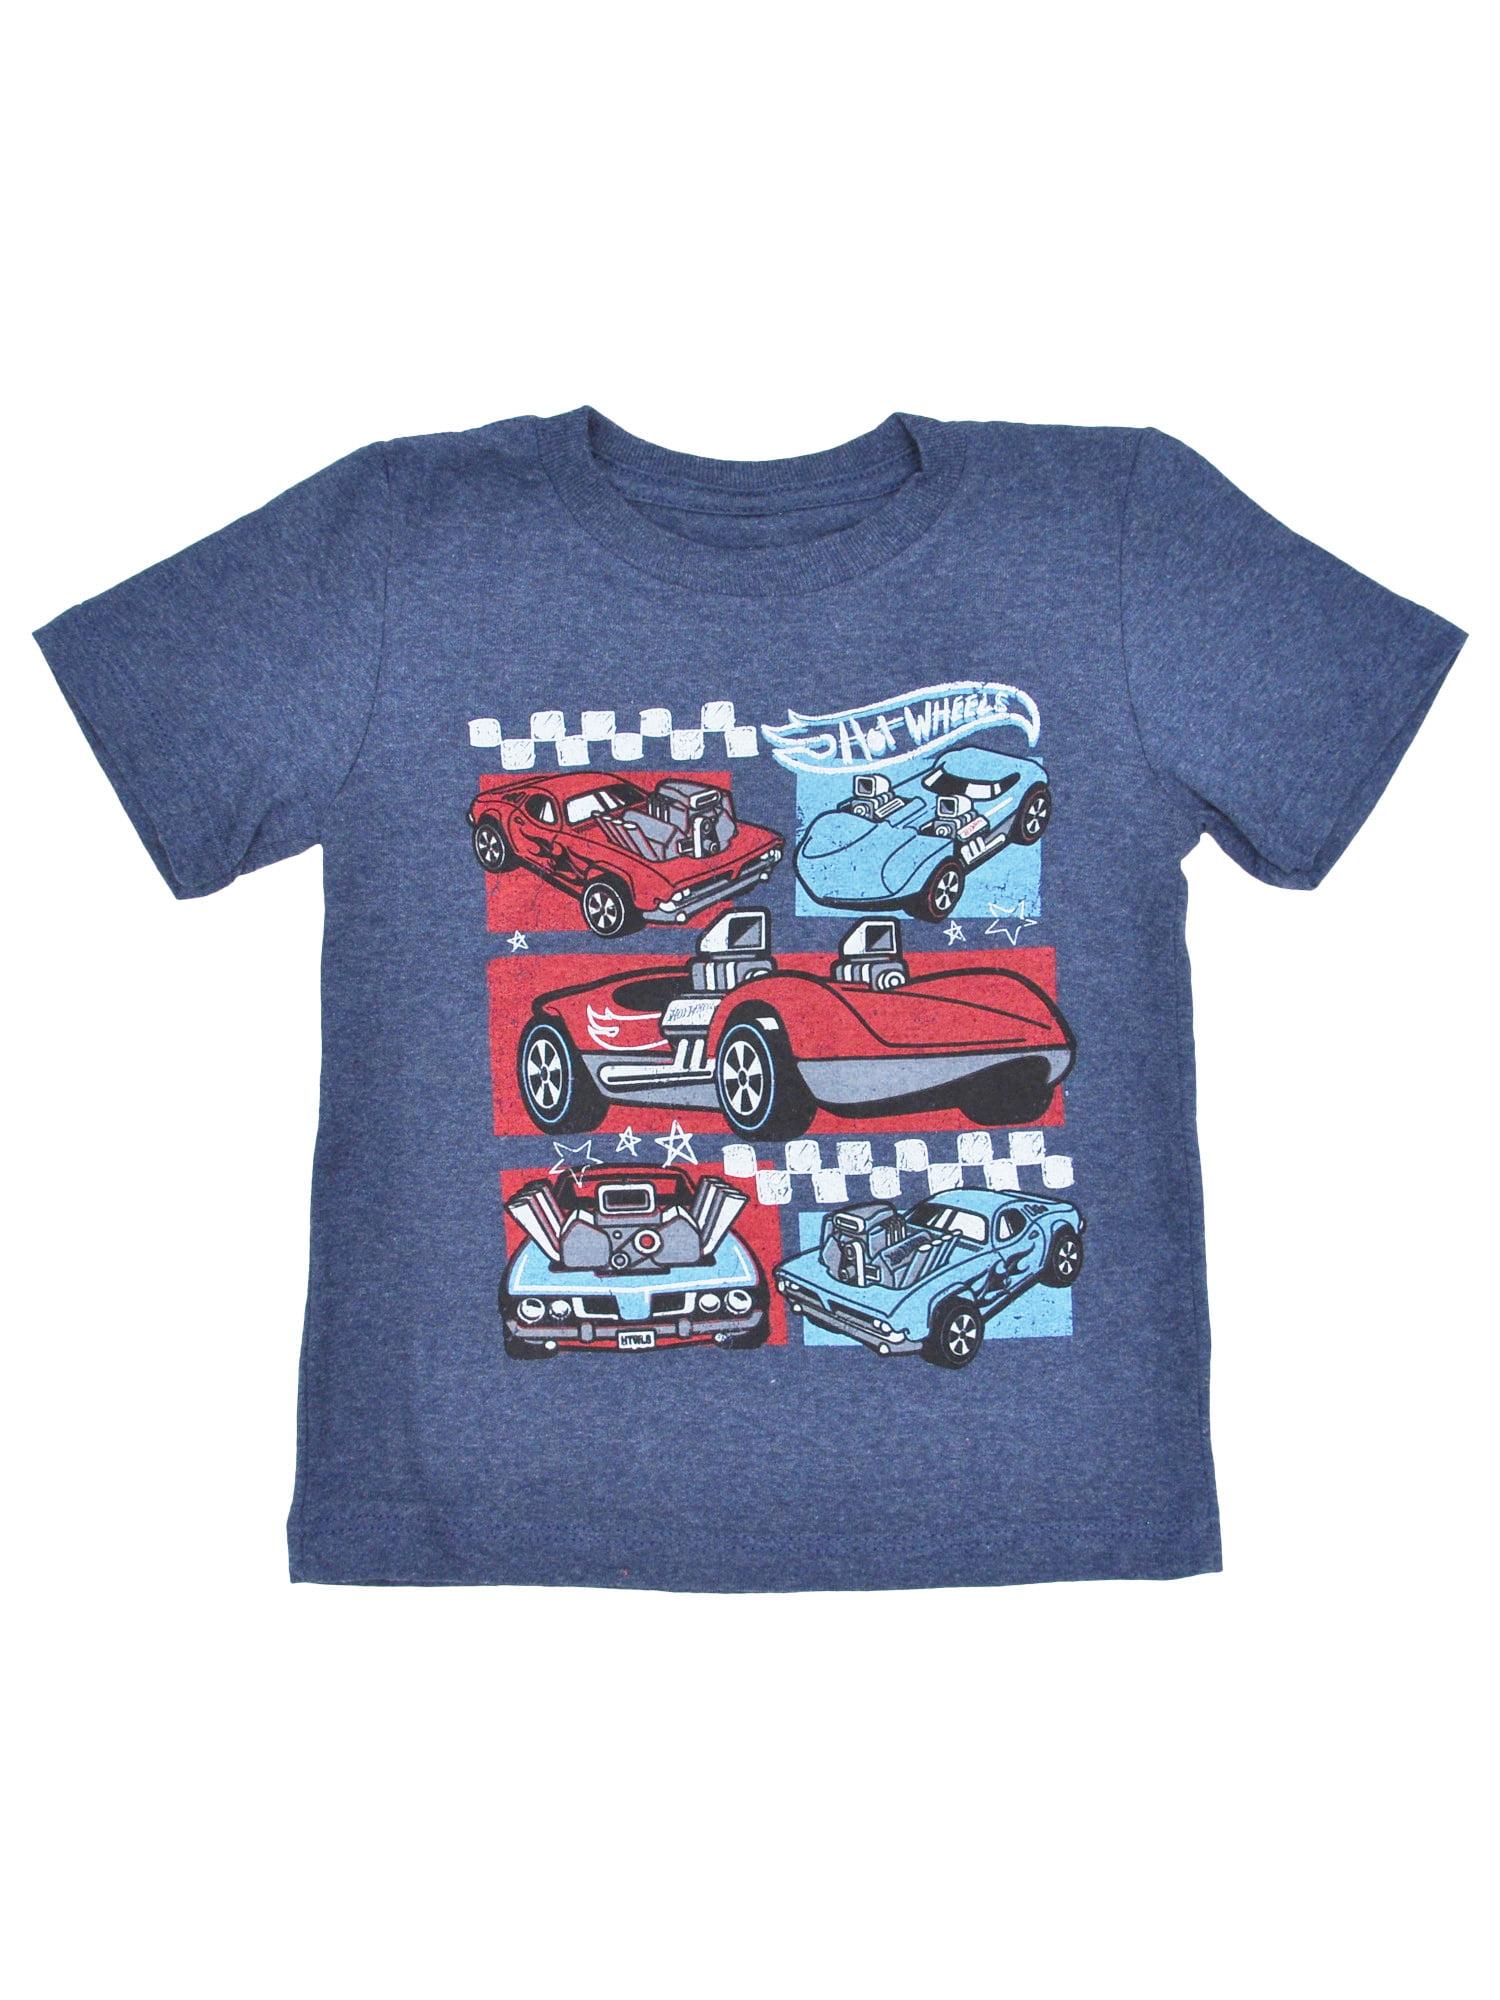 Toddler Boys Hot Wheels T-Shirt - Short Sleeve Blue